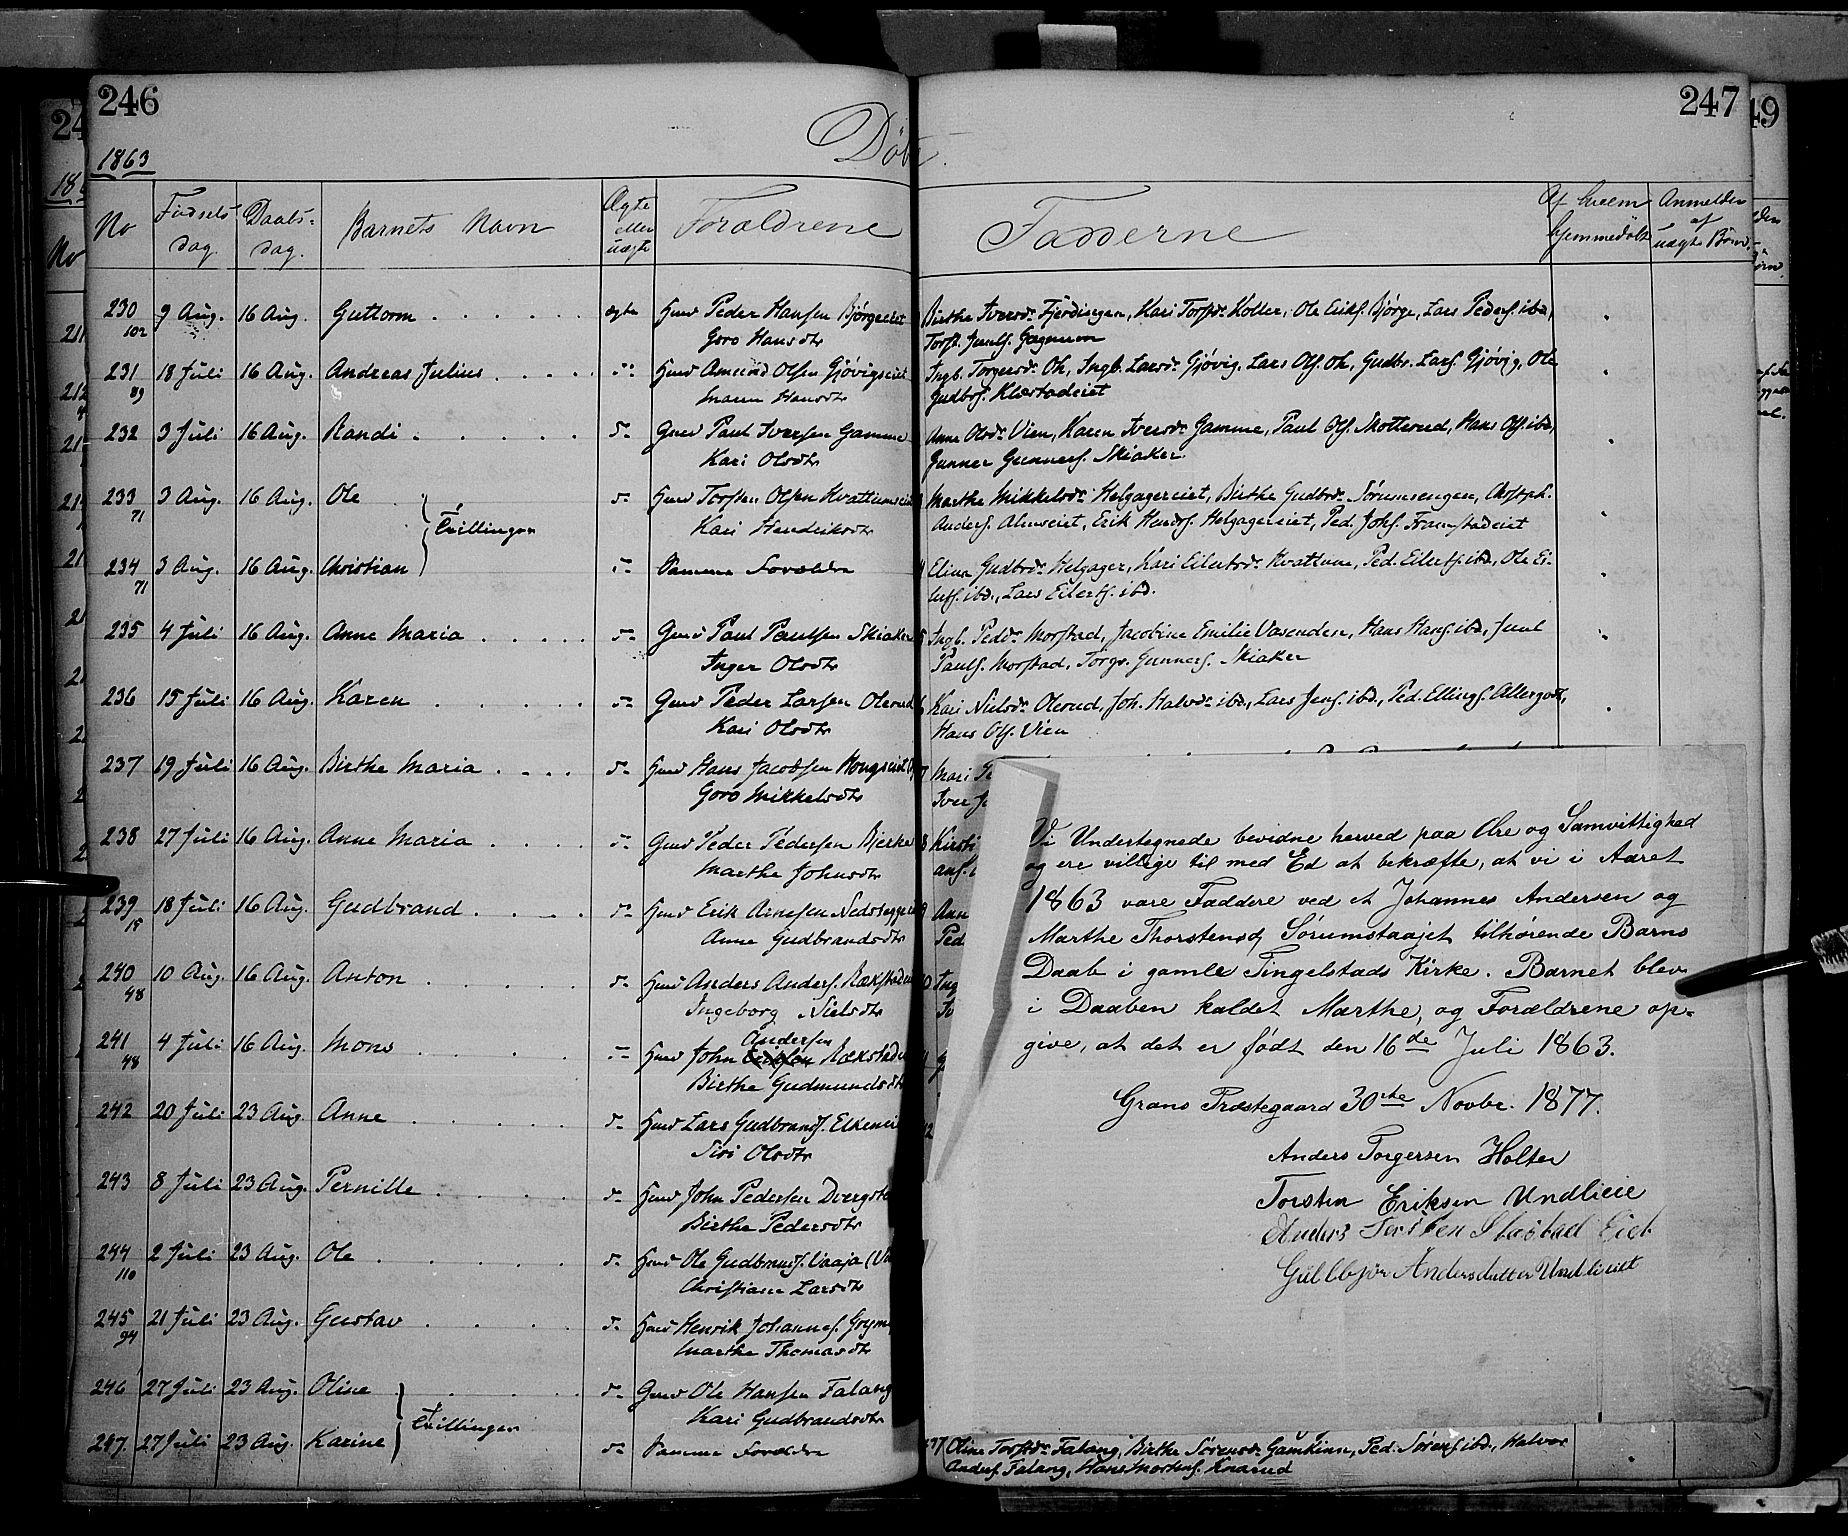 SAH, Gran prestekontor, Ministerialbok nr. 12, 1856-1874, s. 246-247